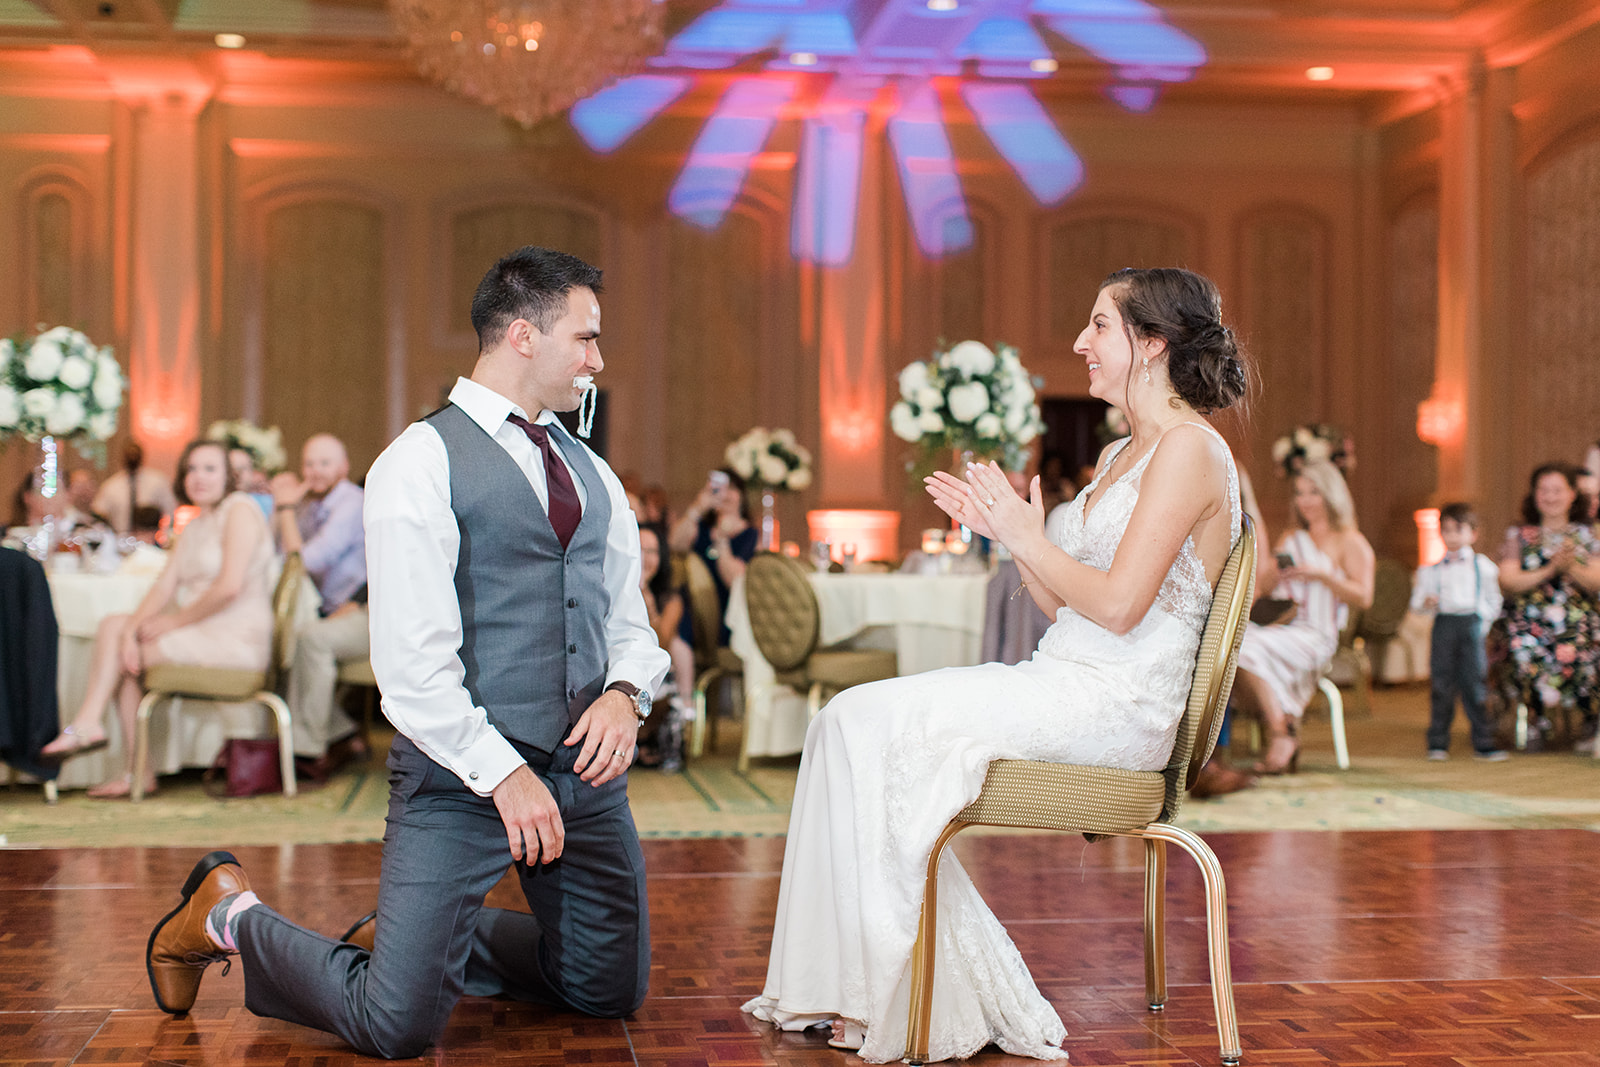 Weddings At Prestonwood Dallas Texas Golf Course, Shira Diamonds